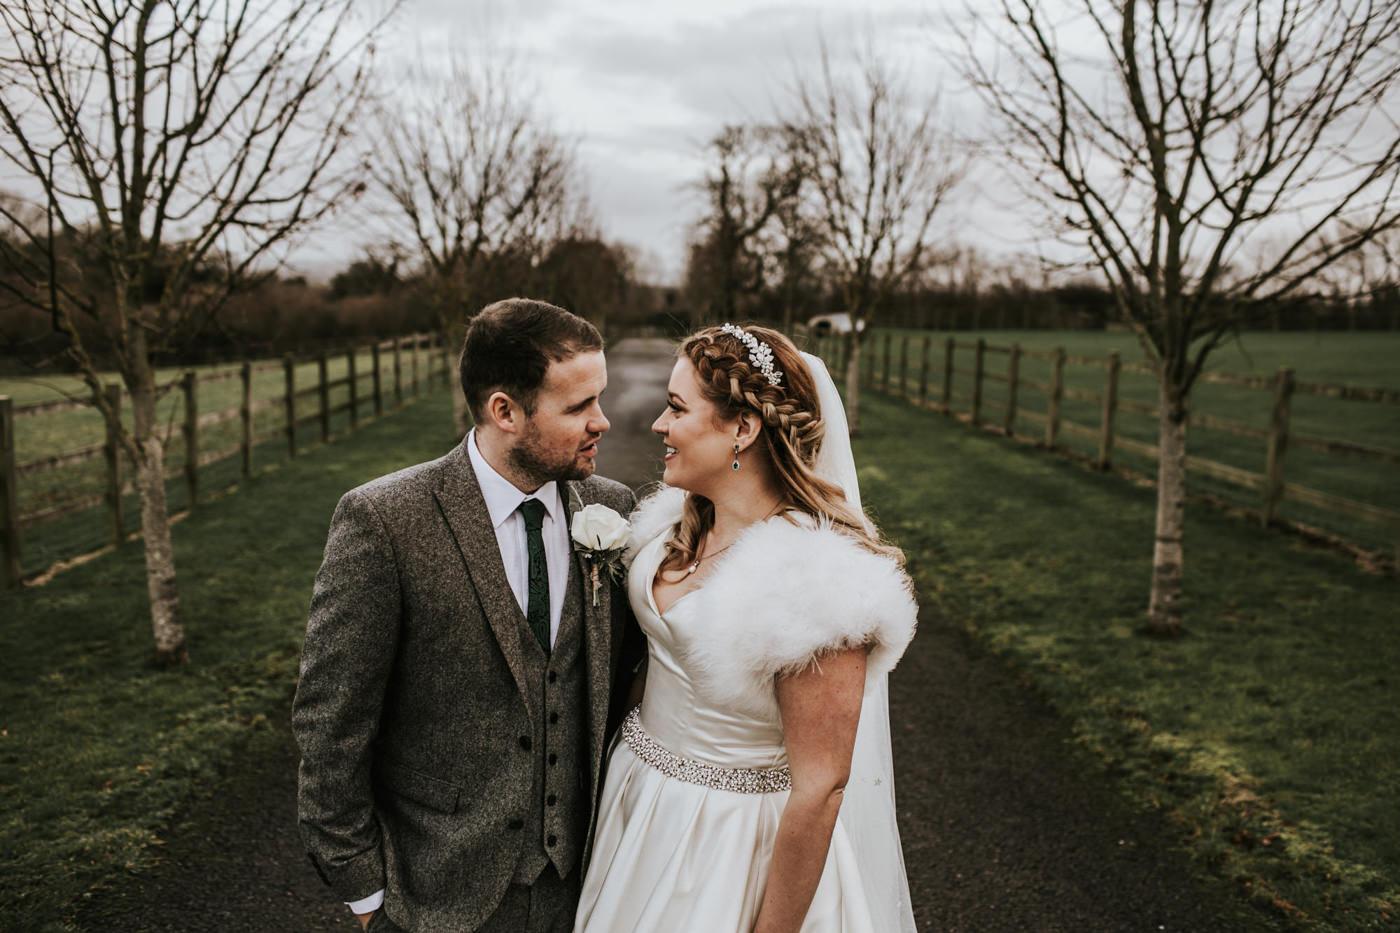 Chris and Emma, Wick Farm, Bath 12